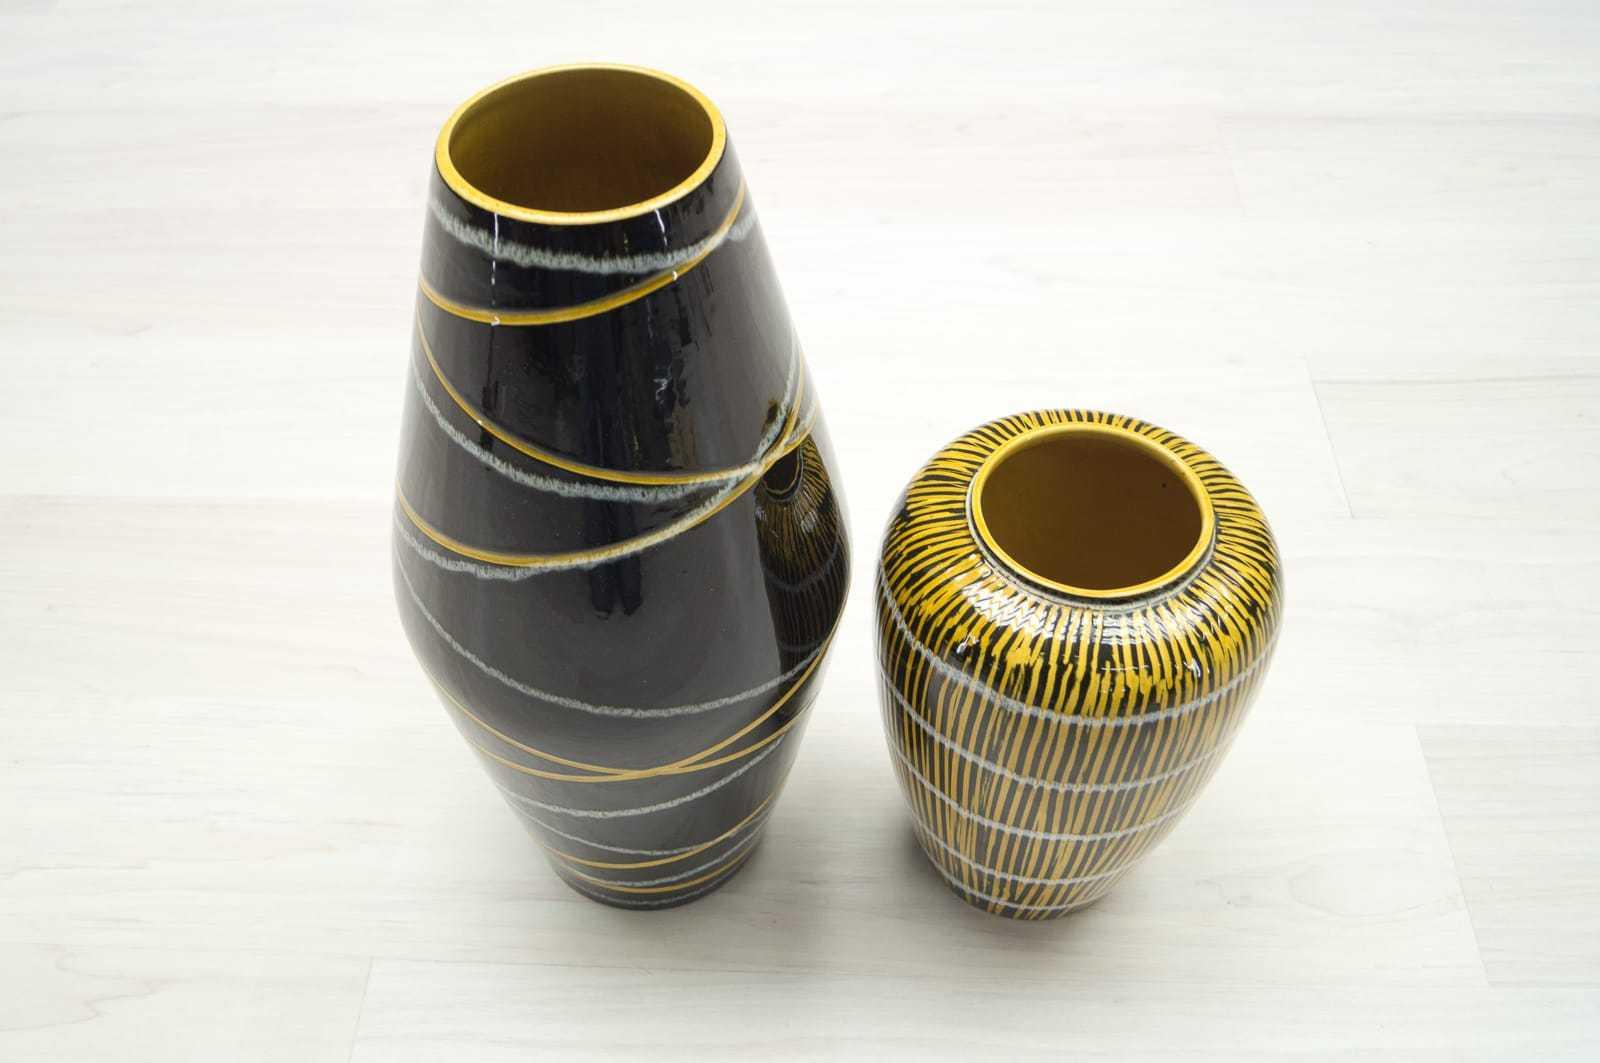 2x foreign keramik vasen gelb schwarz mid century 50er. Black Bedroom Furniture Sets. Home Design Ideas